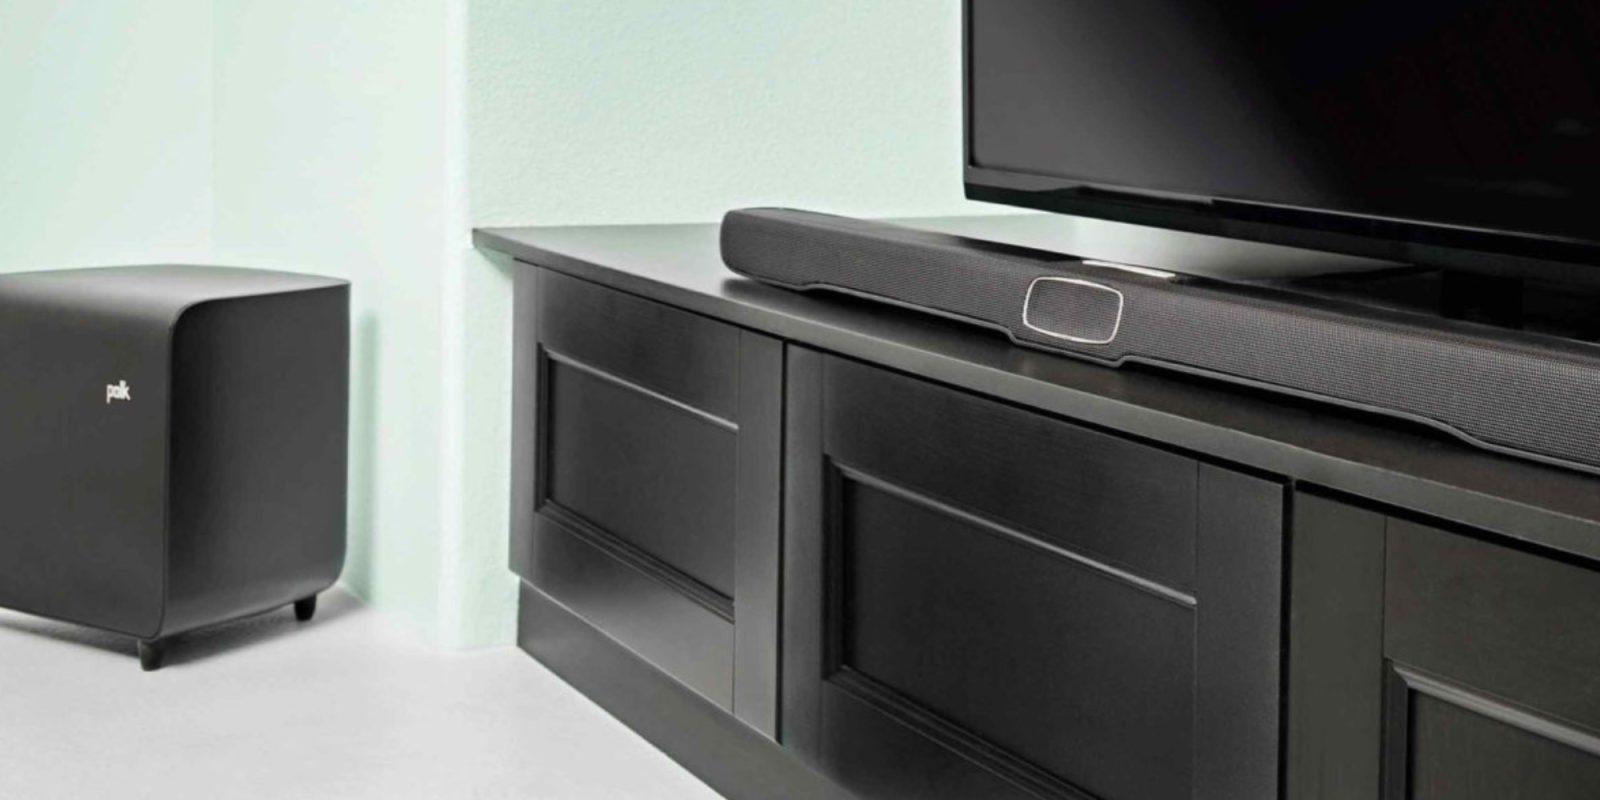 Improve your TV's audio for $300 w/ this Polk Omni Soundbar (20% off)